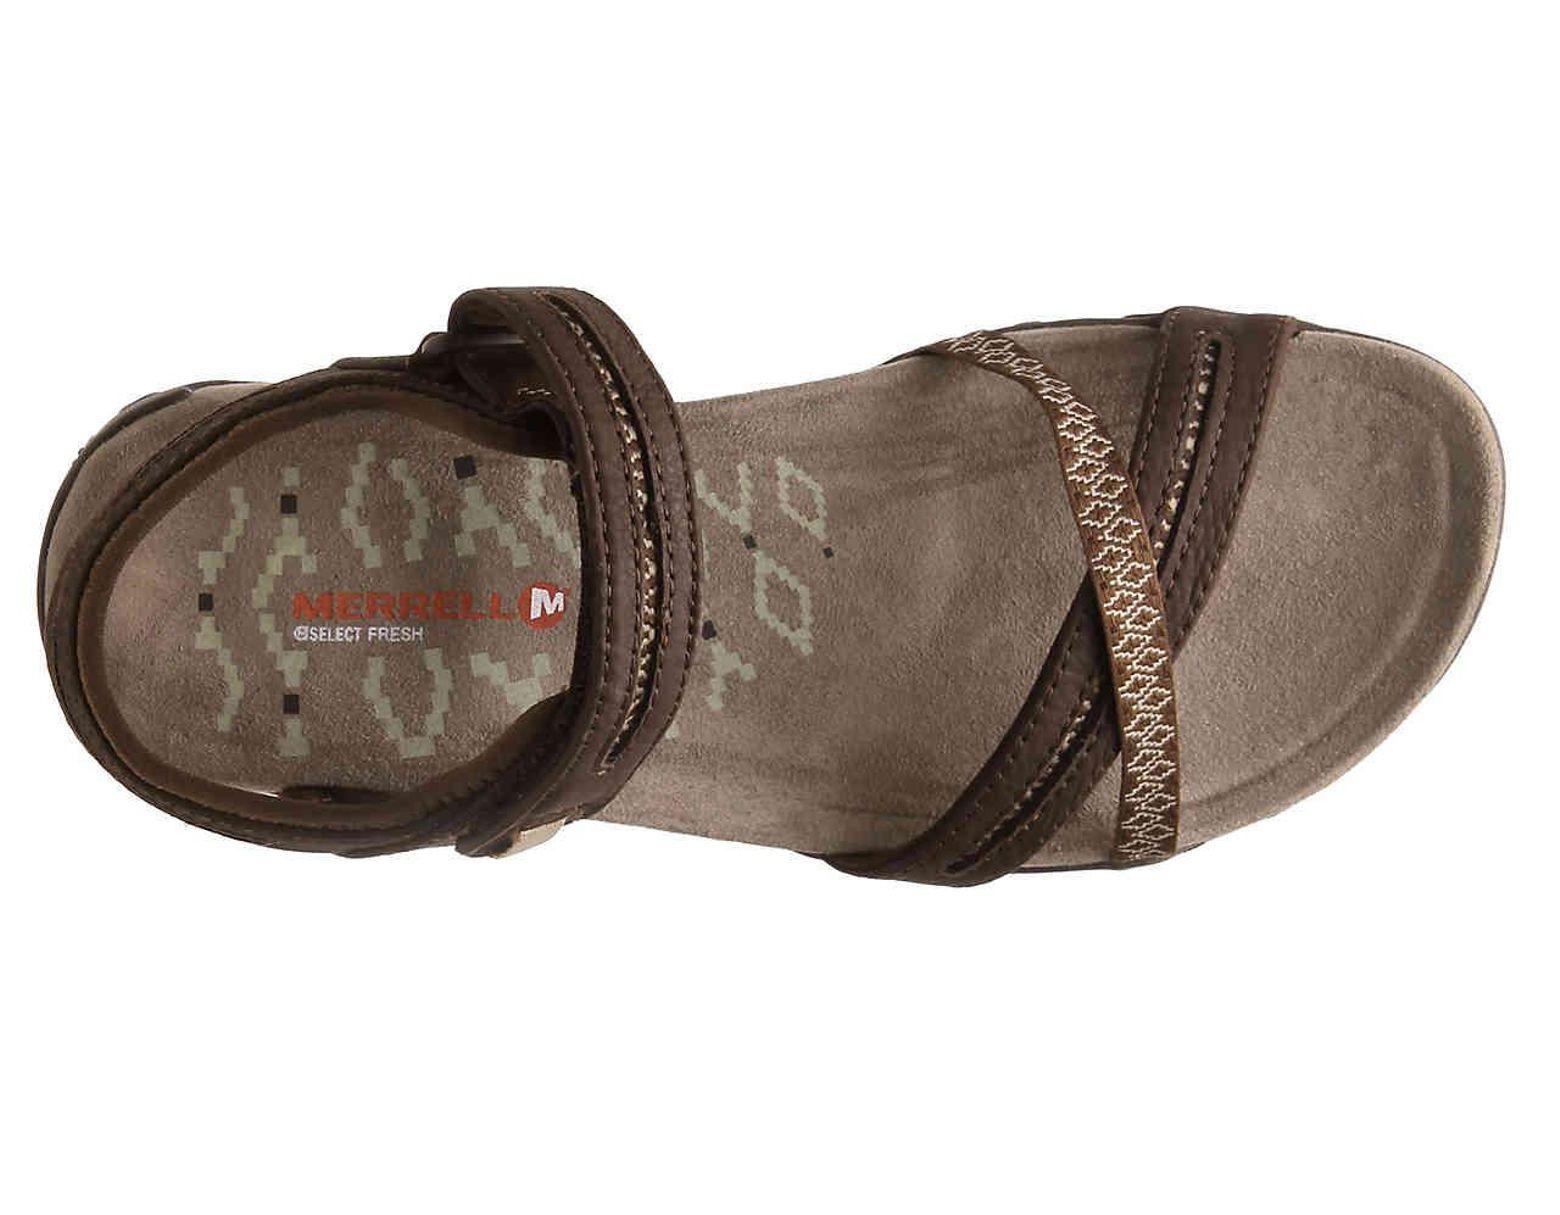 6b421f0a764c Lyst - Merrell Terran Cross Ii Sport Sandal in Brown